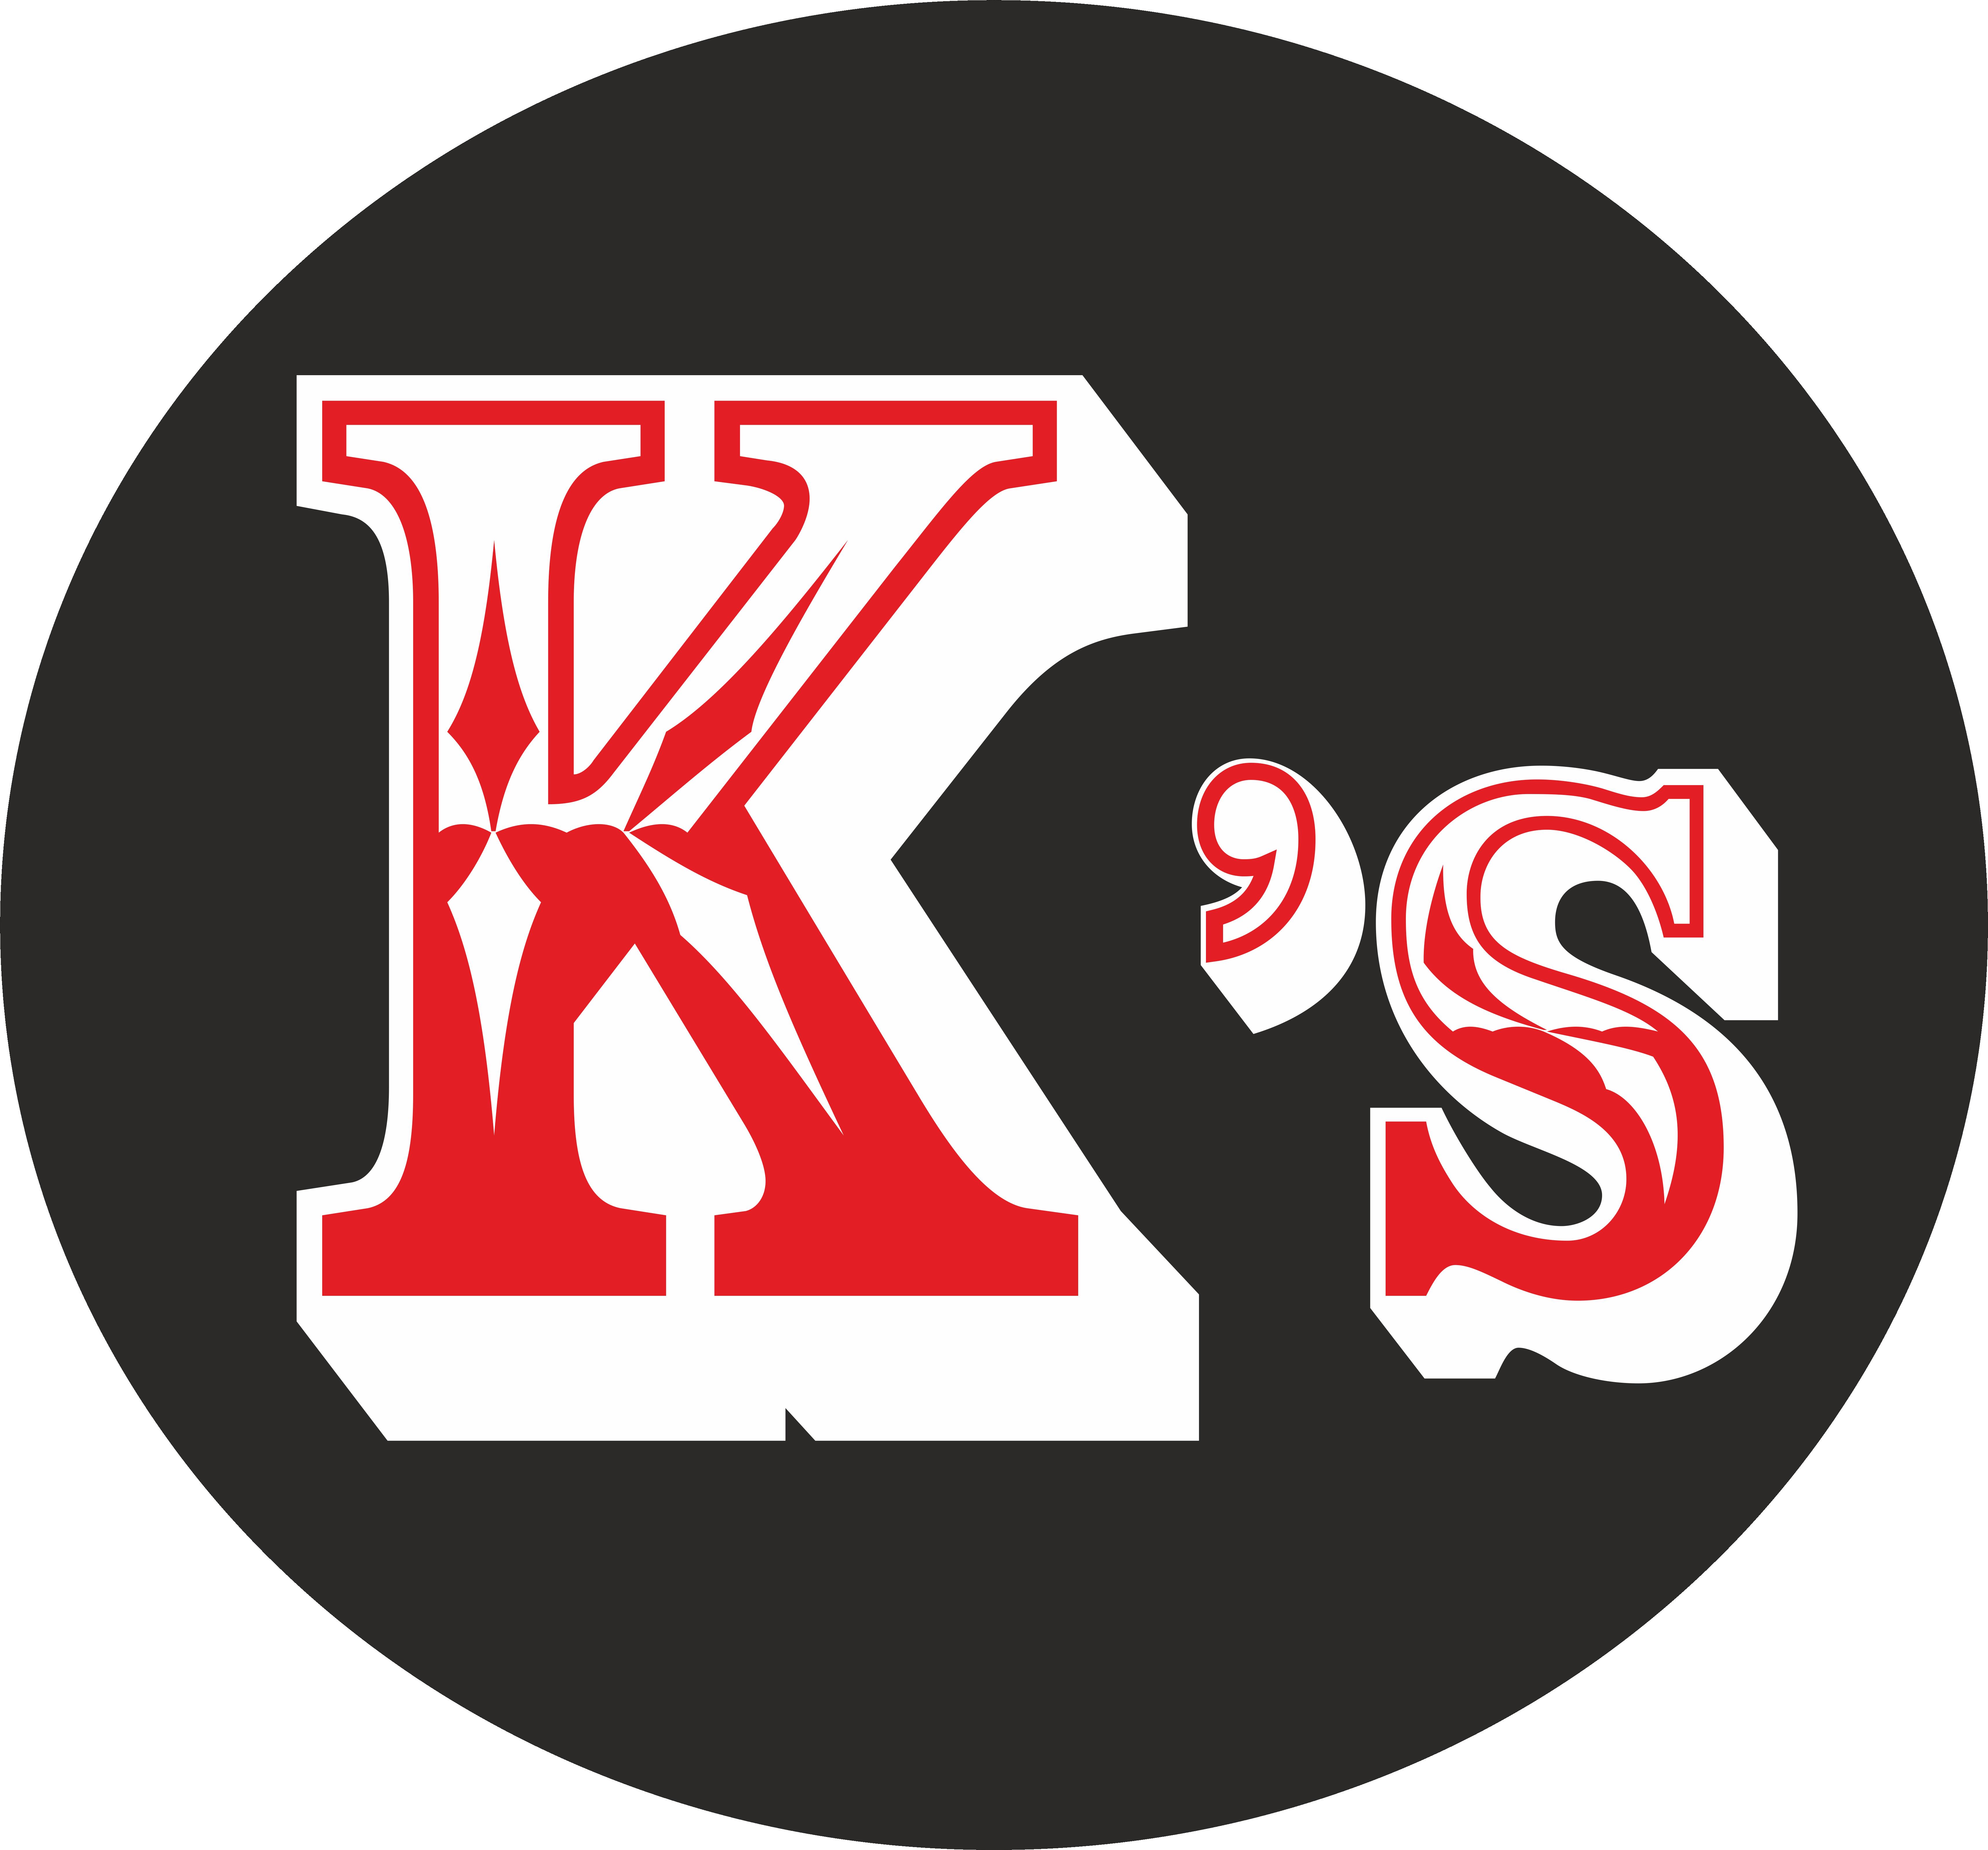 K s bar and. Clipart restaurant restaurant reservation